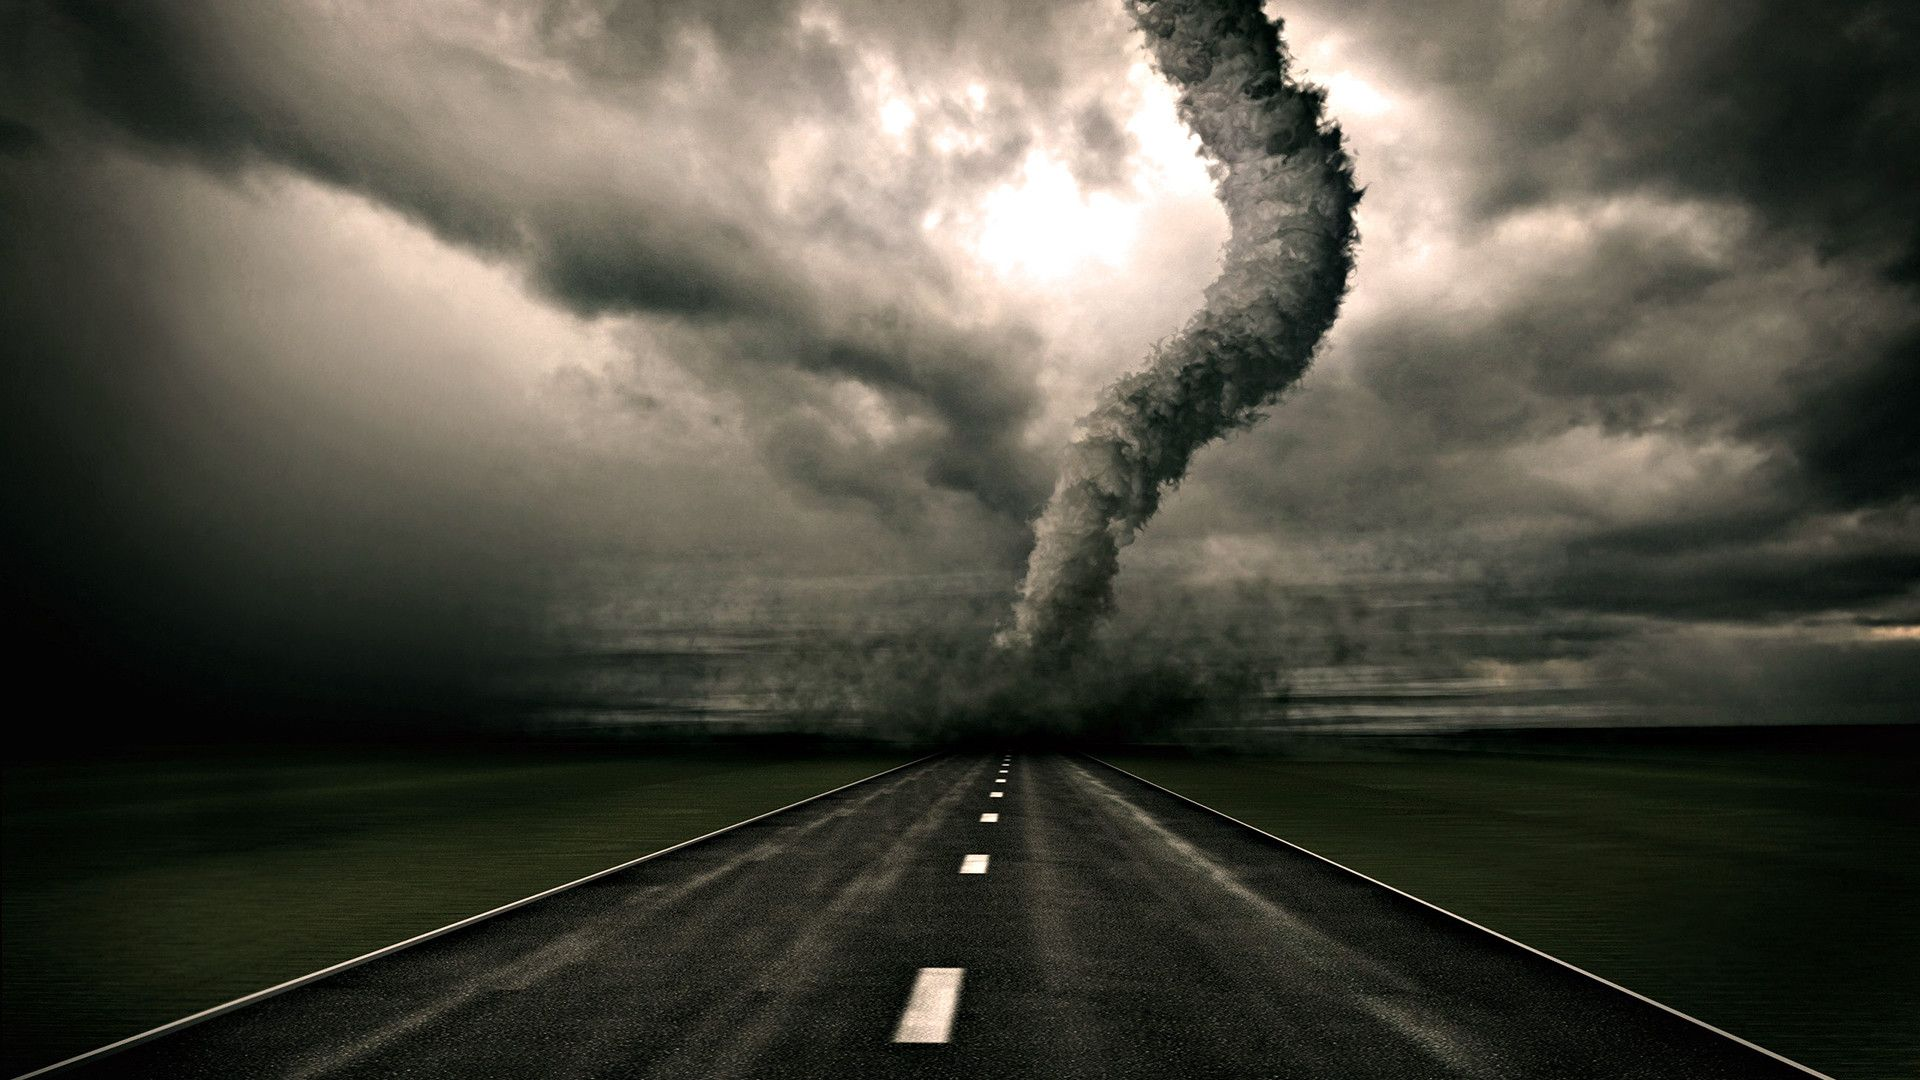 HD Tornado Wallpapers - Top Free HD ...